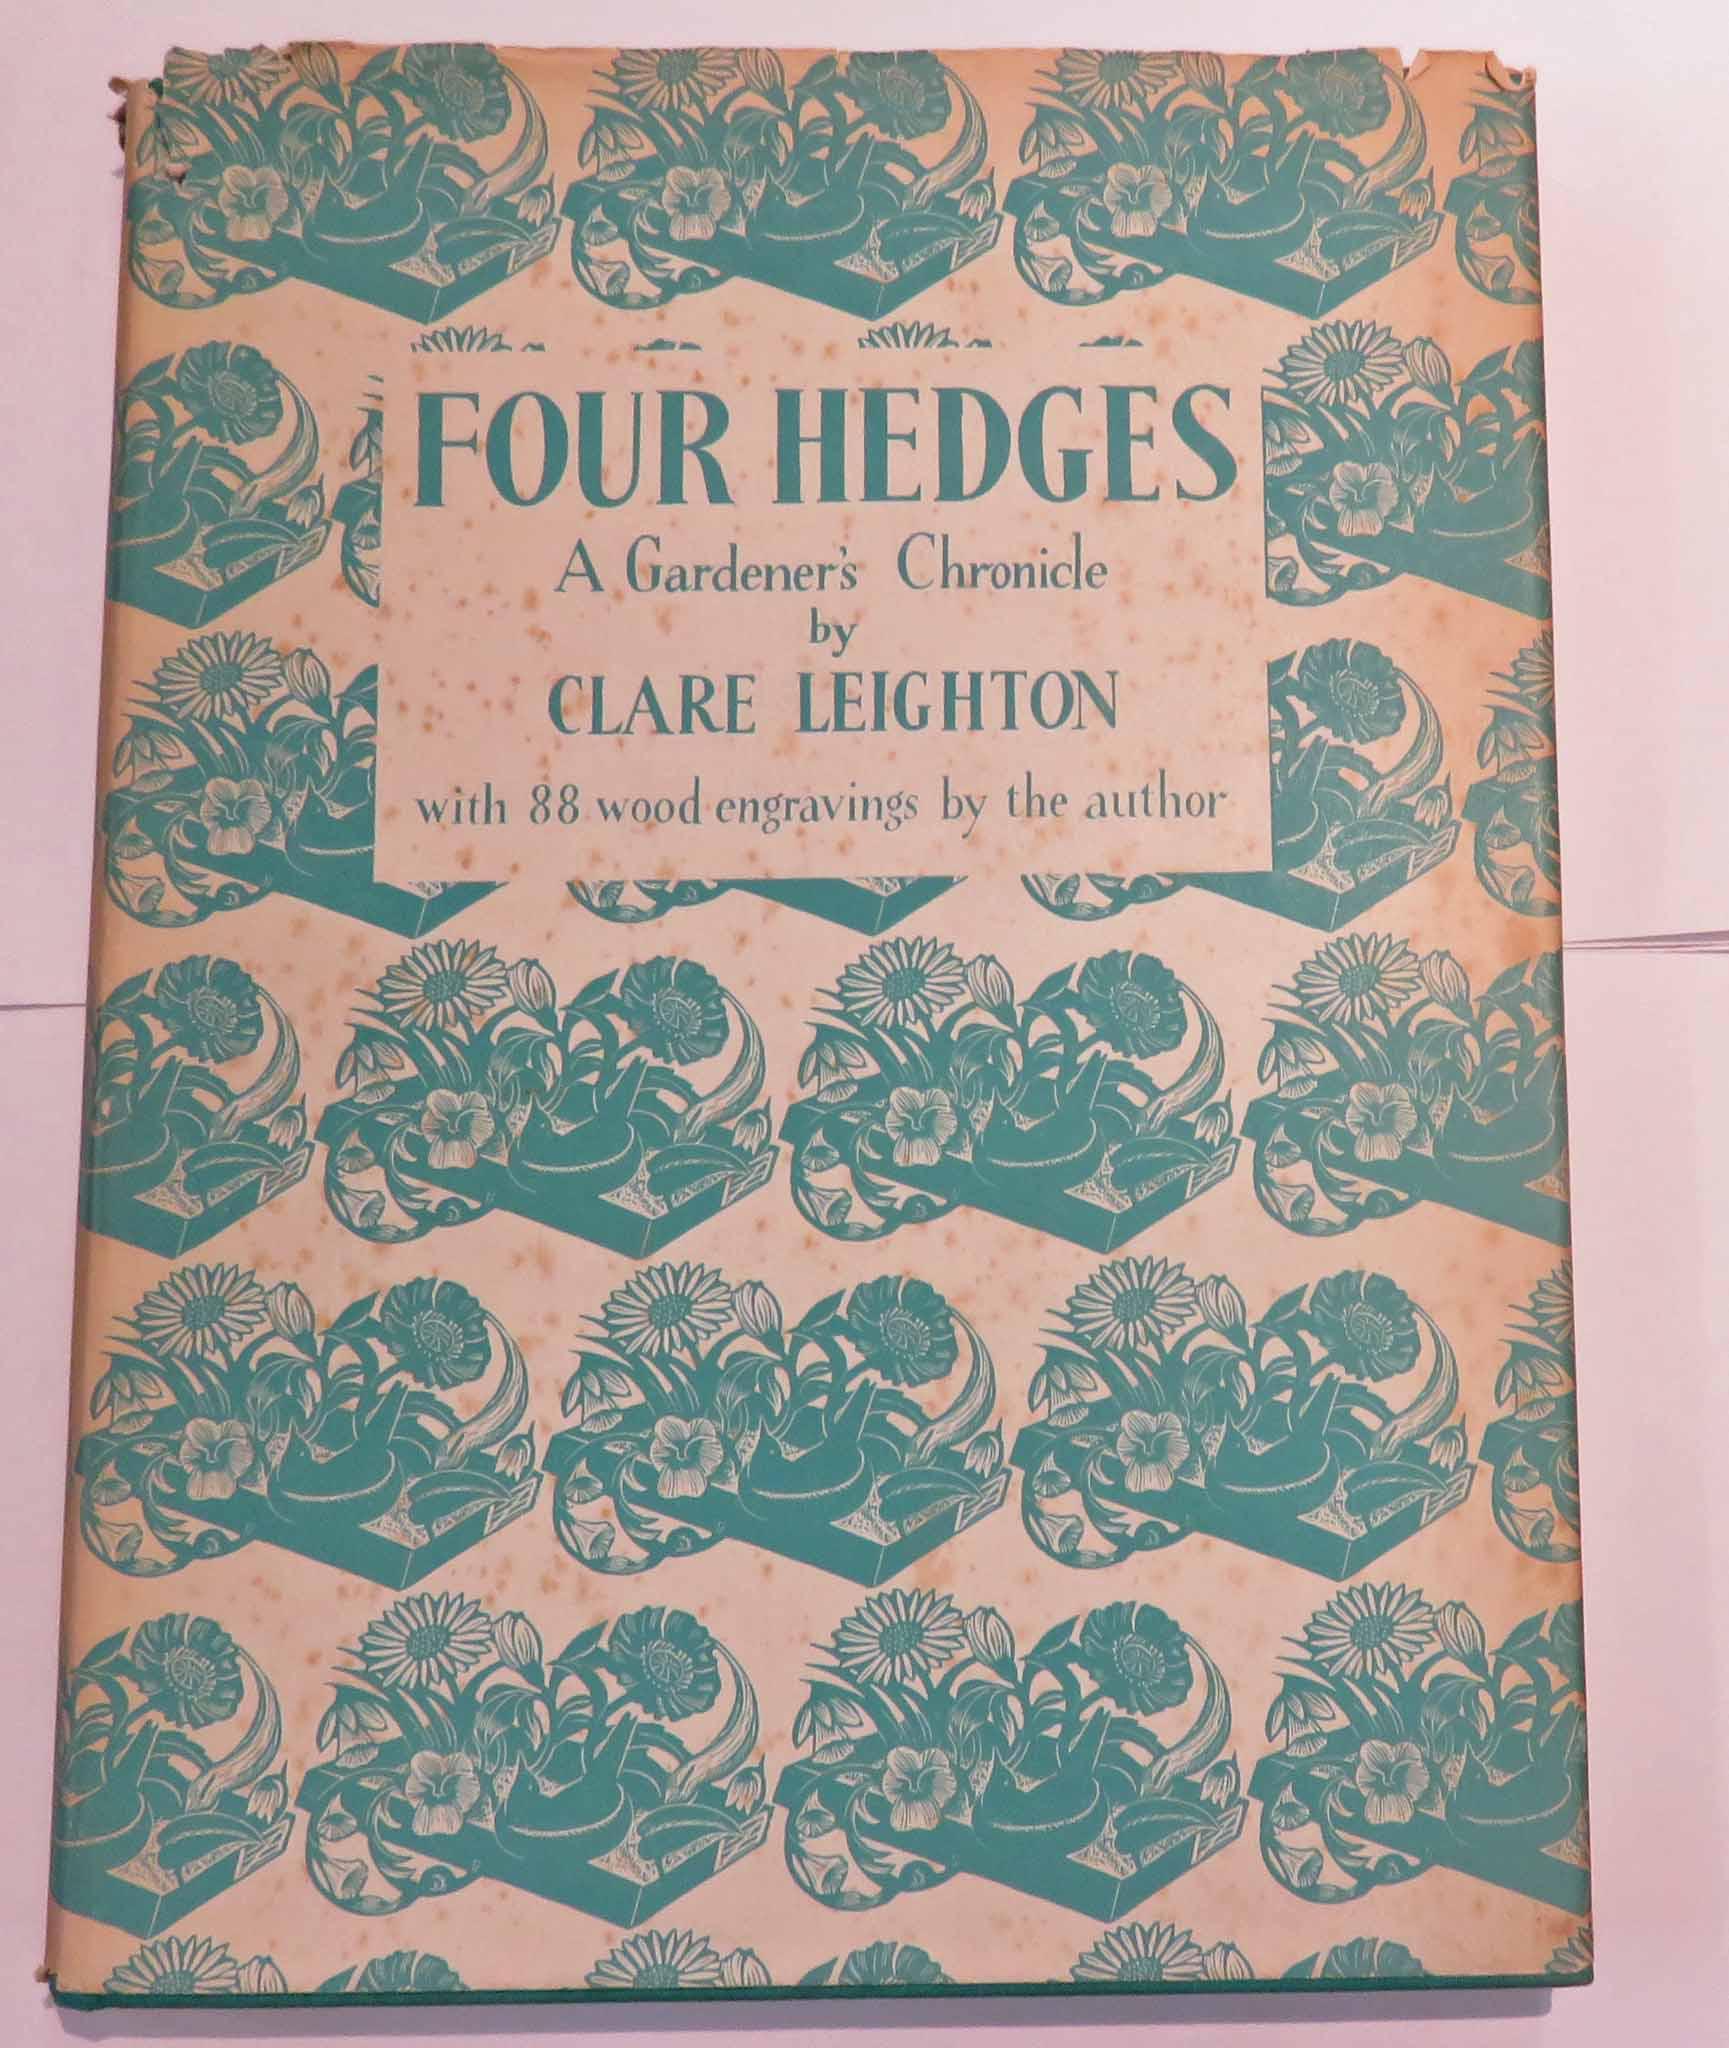 Four Hedges A Gardener's Chronicle